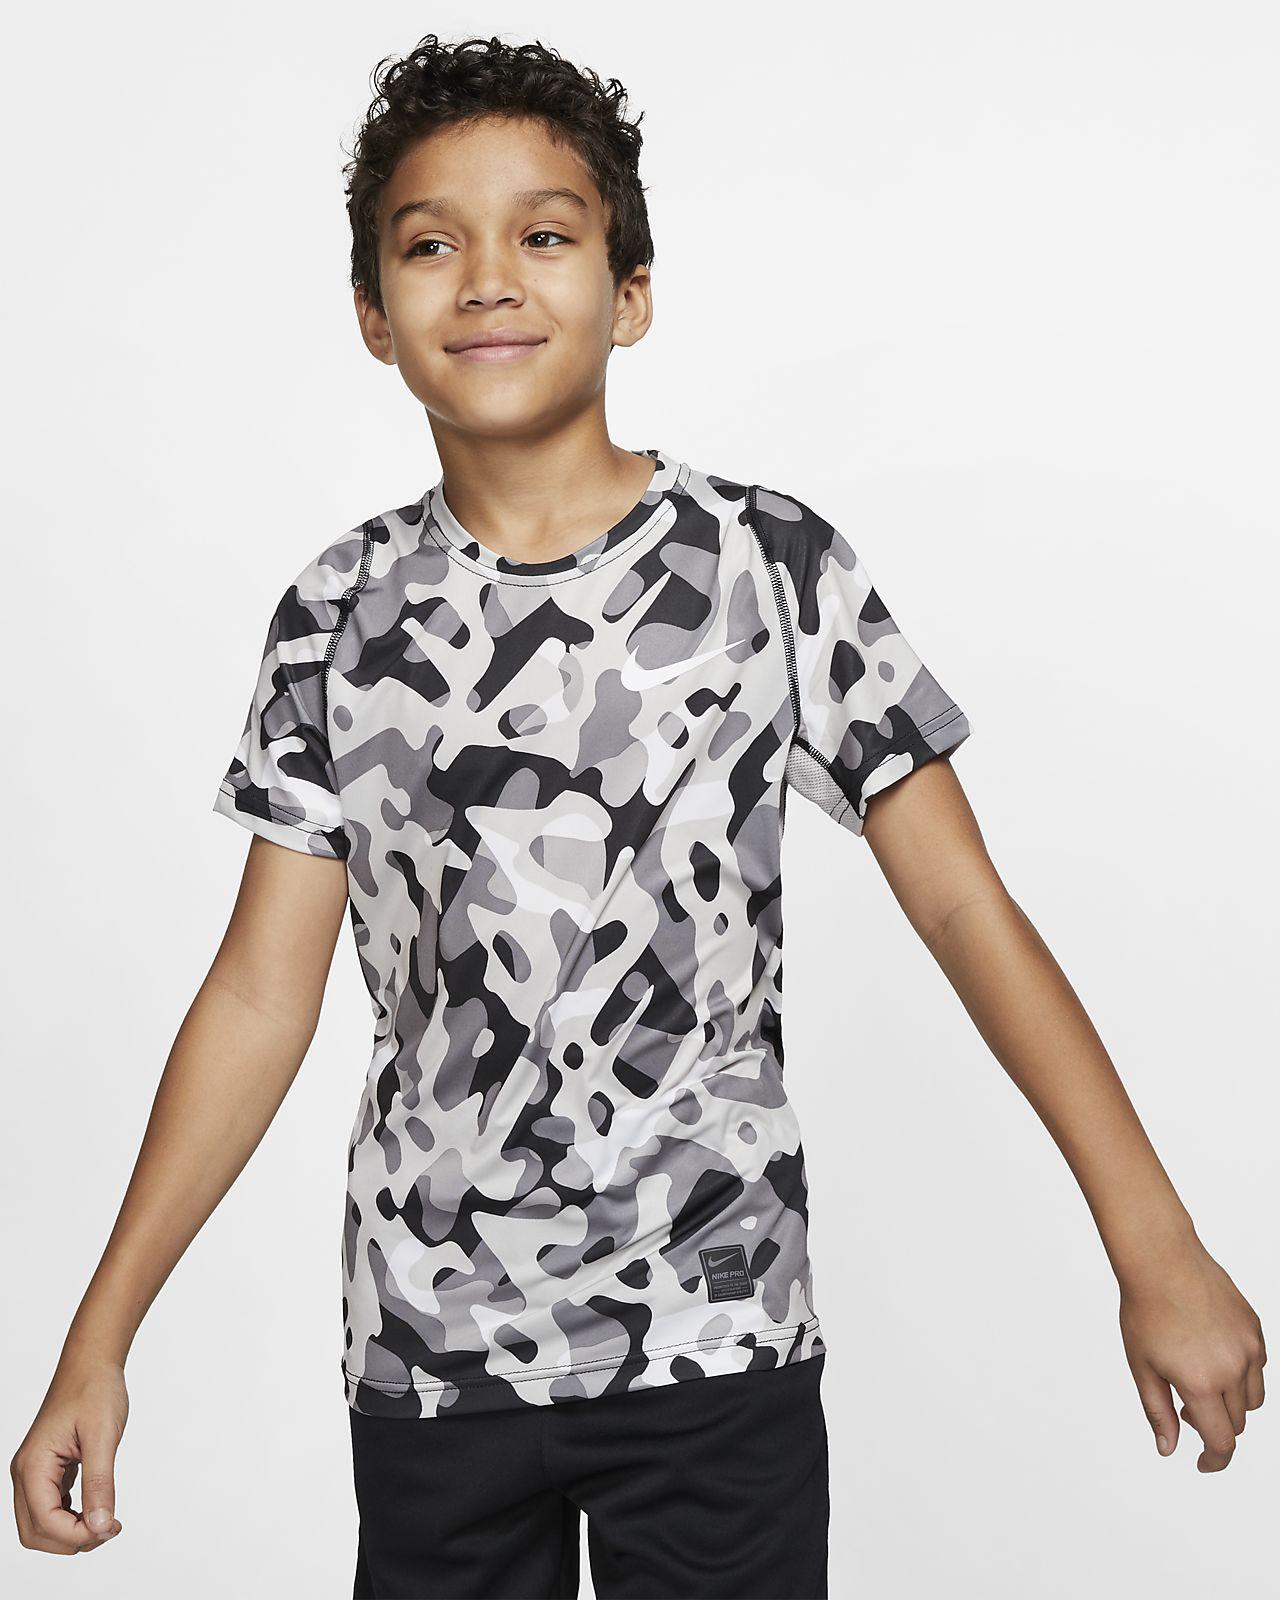 Prenda para la parte superior estampada de manga corta para niño Nike Pro